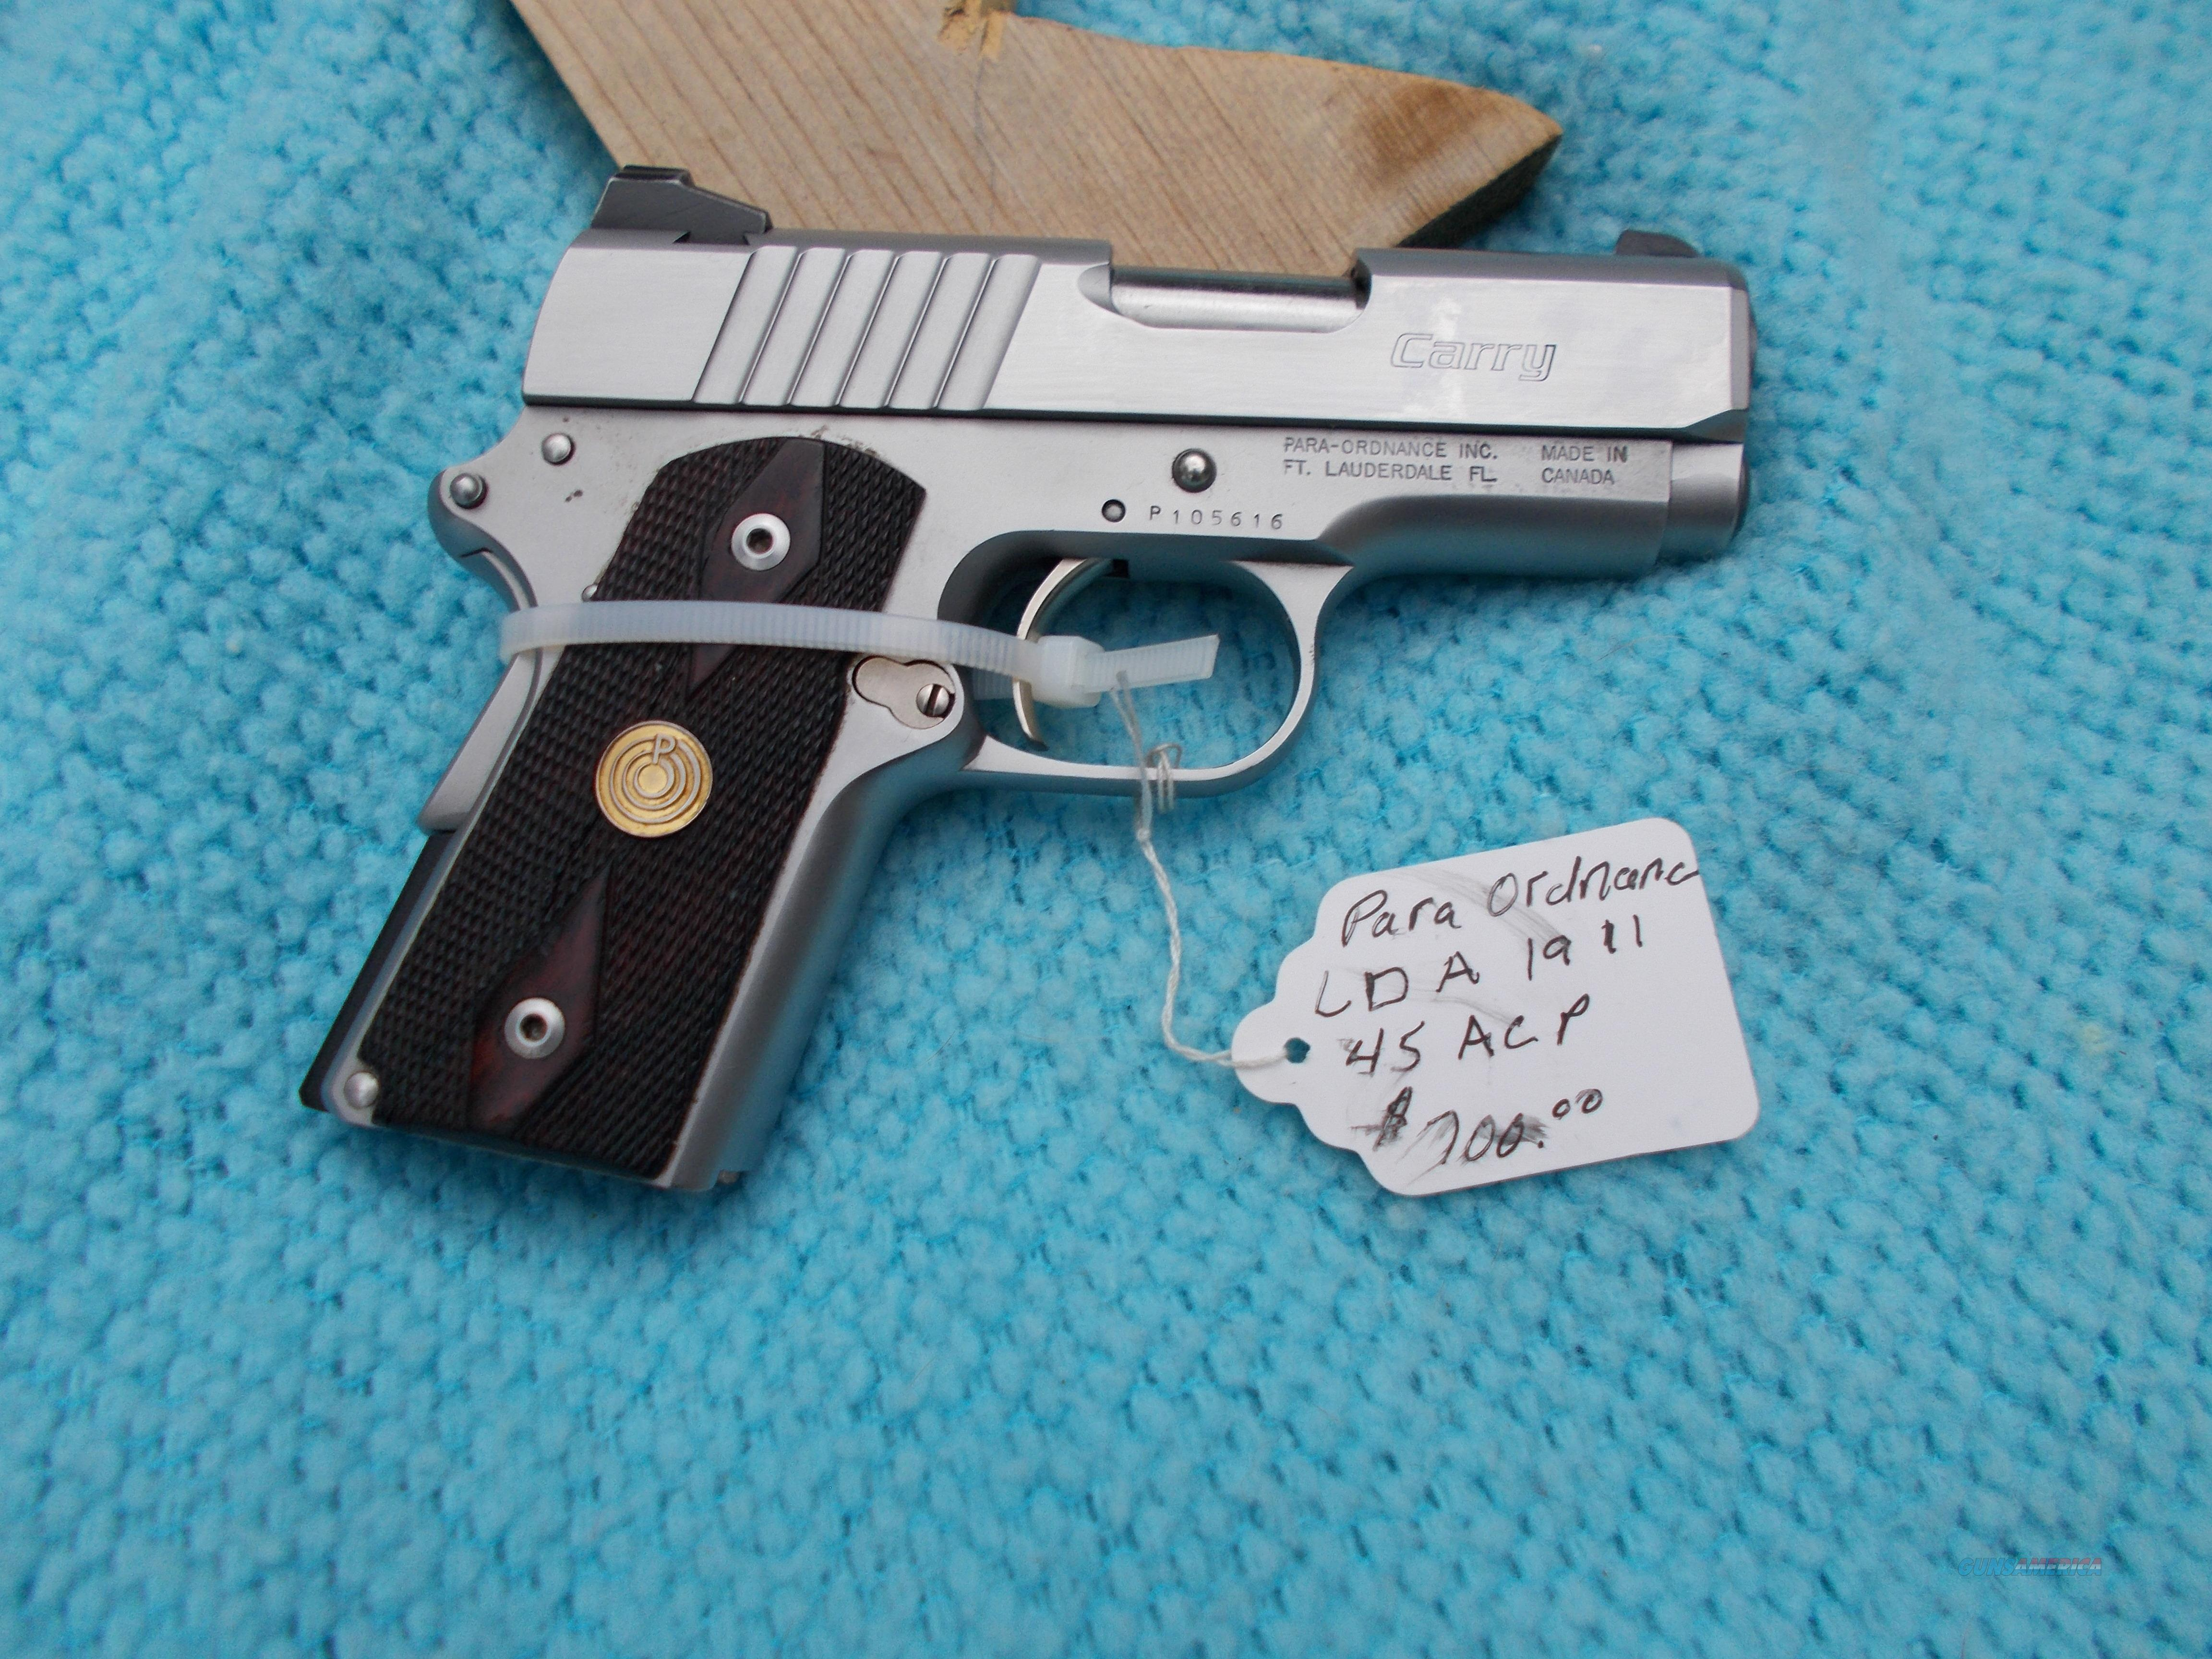 para ordnance LDA 1911 Carry 45acp  Guns > Pistols > Para Ordnance Pistols